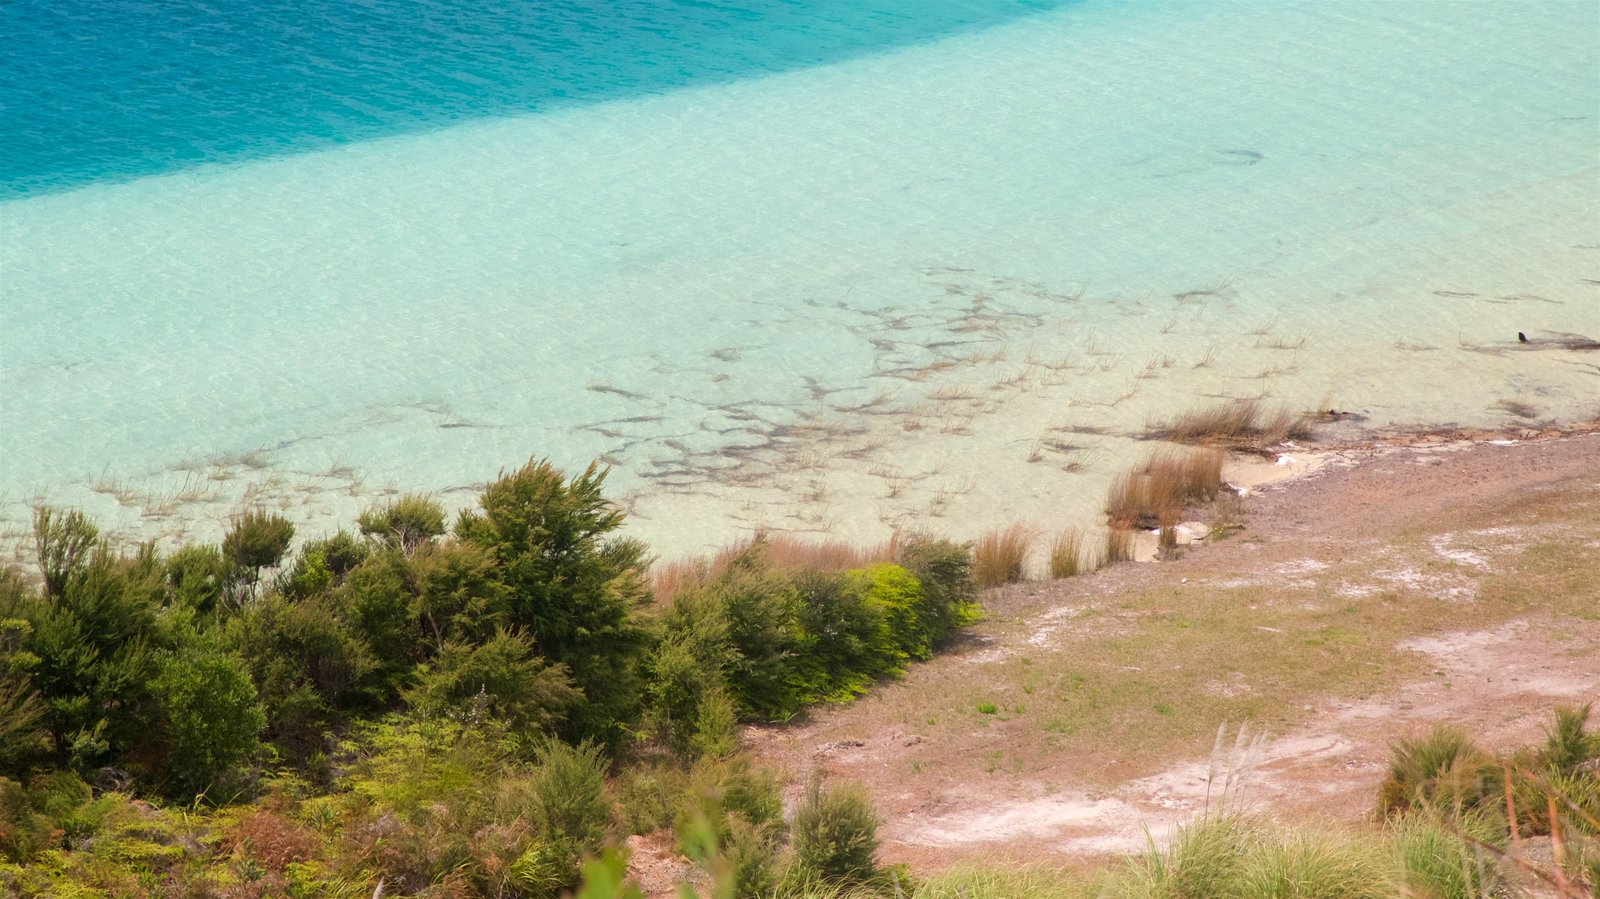 Kai Iwi Lakes featuring a lake or waterhole